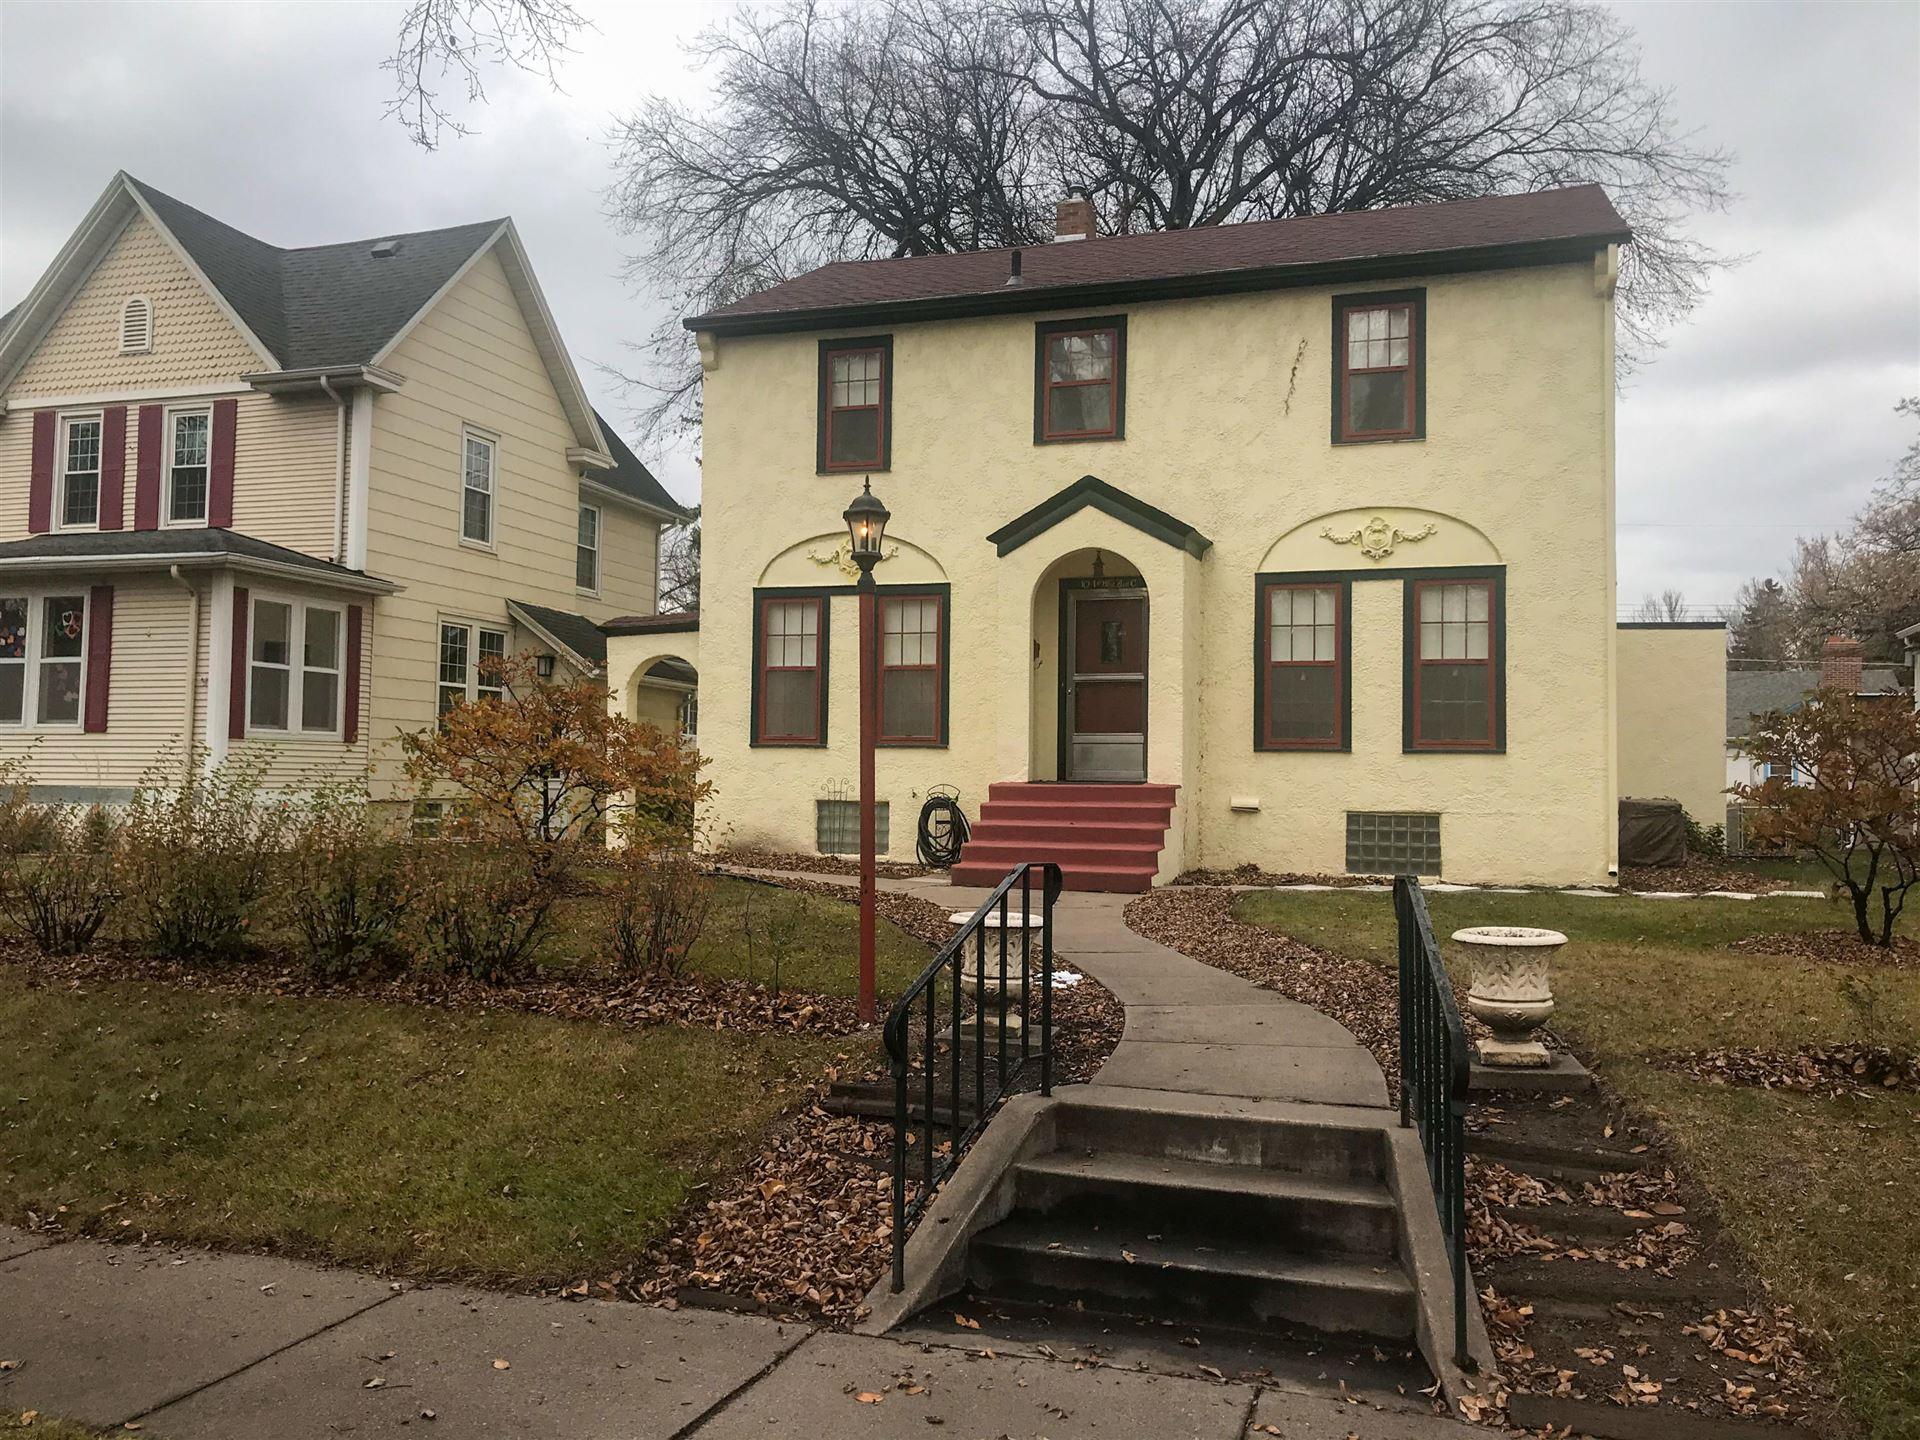 104 W Ave C, Bismarck, ND 58501 - #: 406219